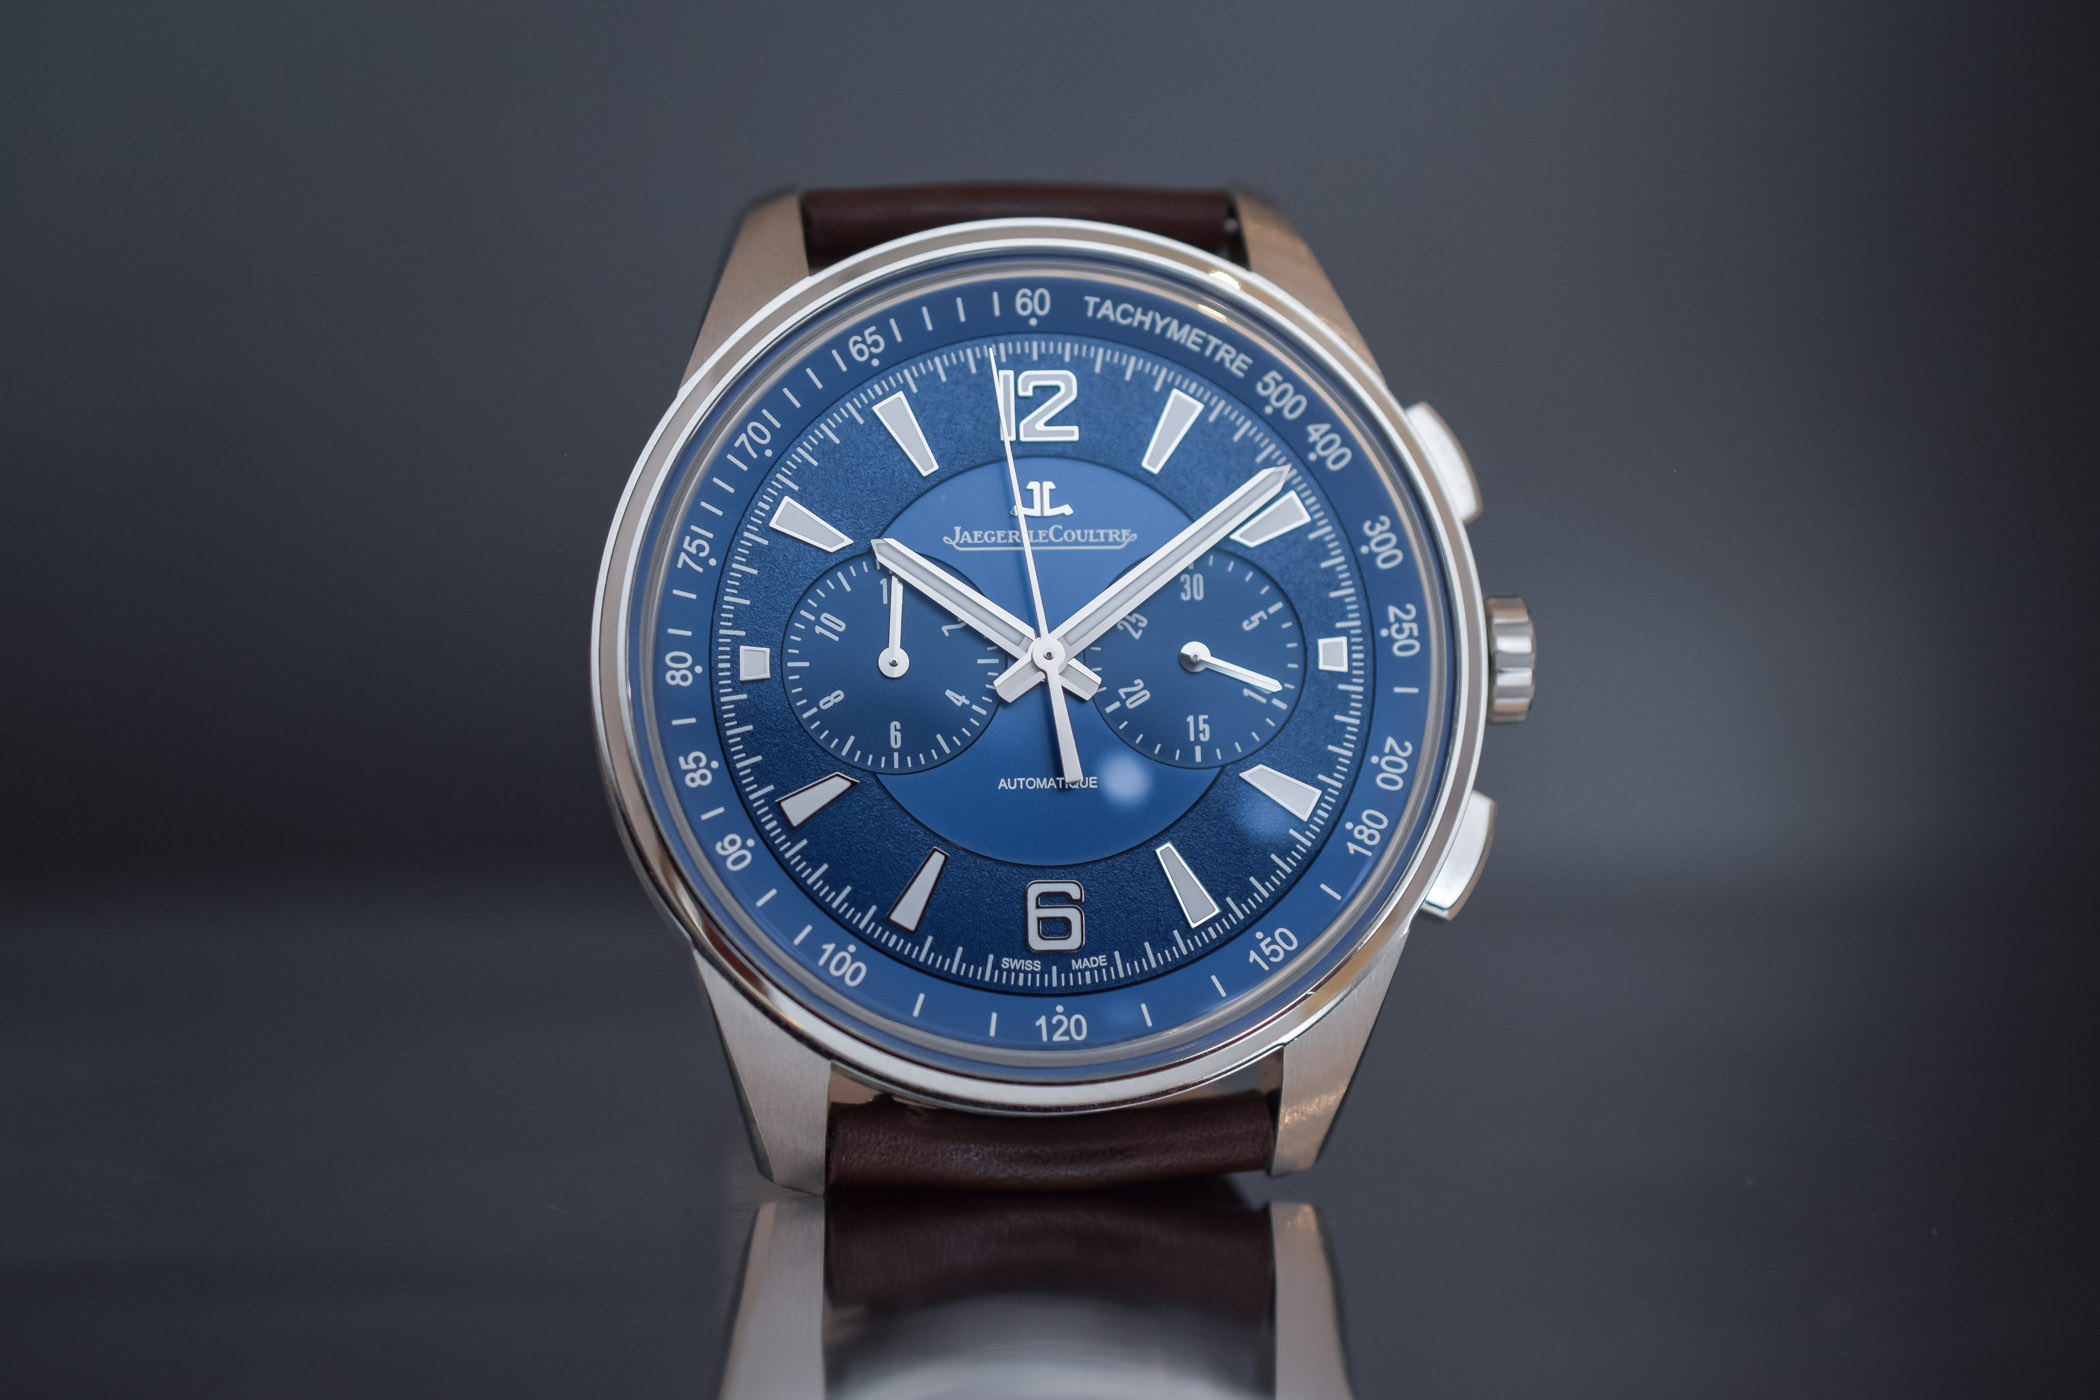 Jaeger LeCoultre Polaris Chronograph 2018 blue